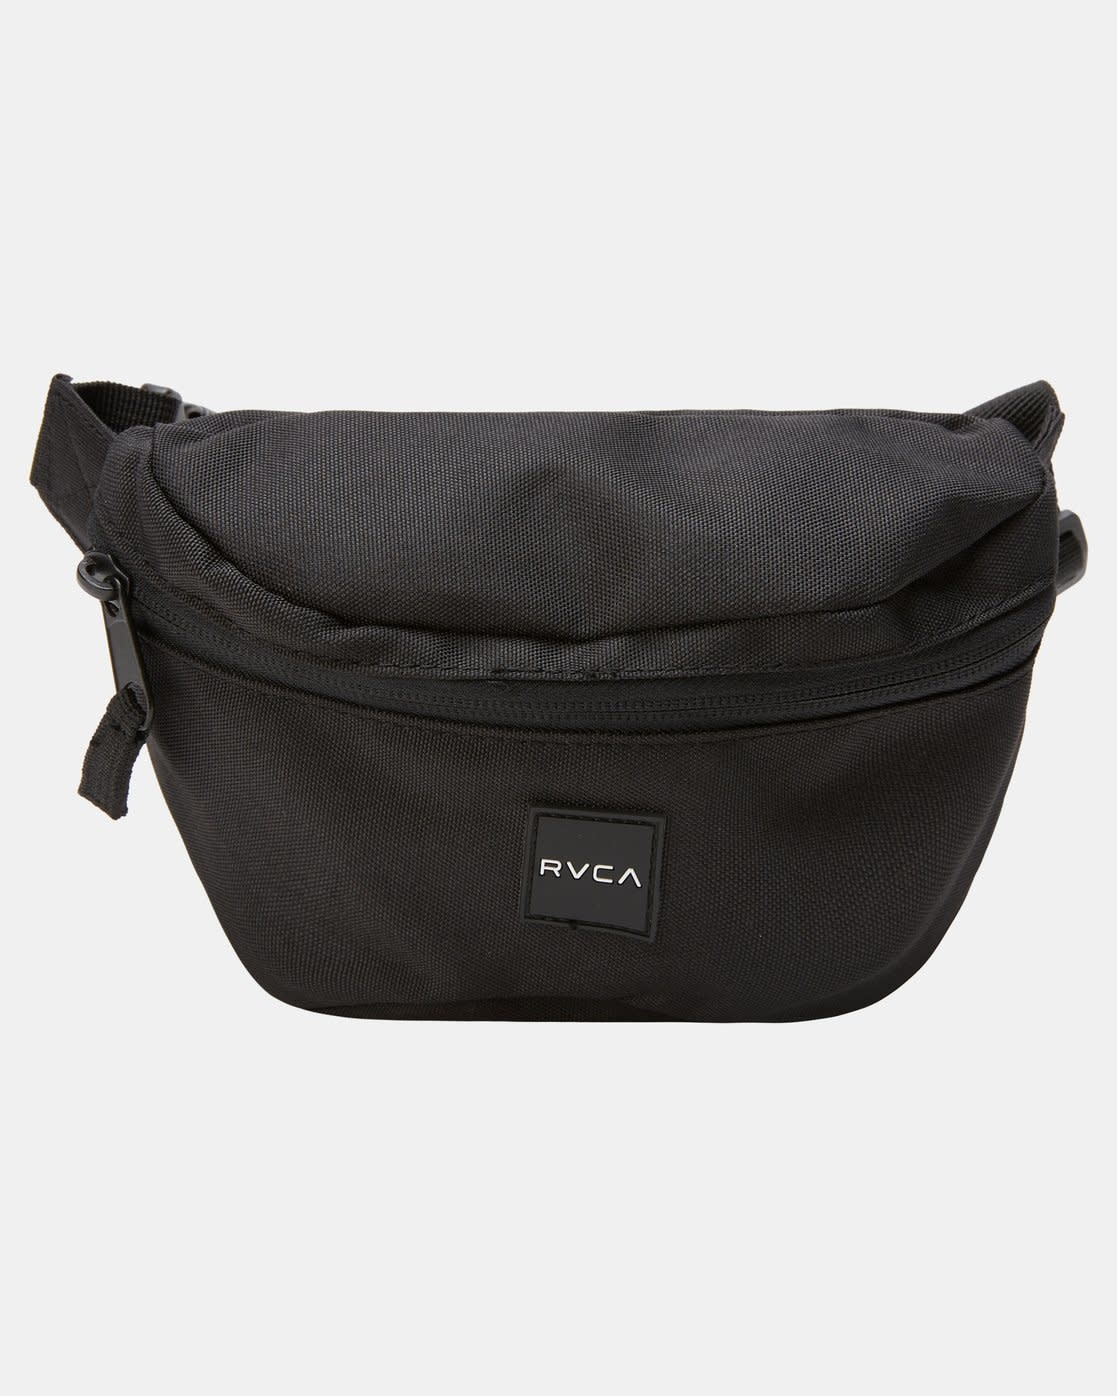 RVCA RVCA Waist Pack 2 Black